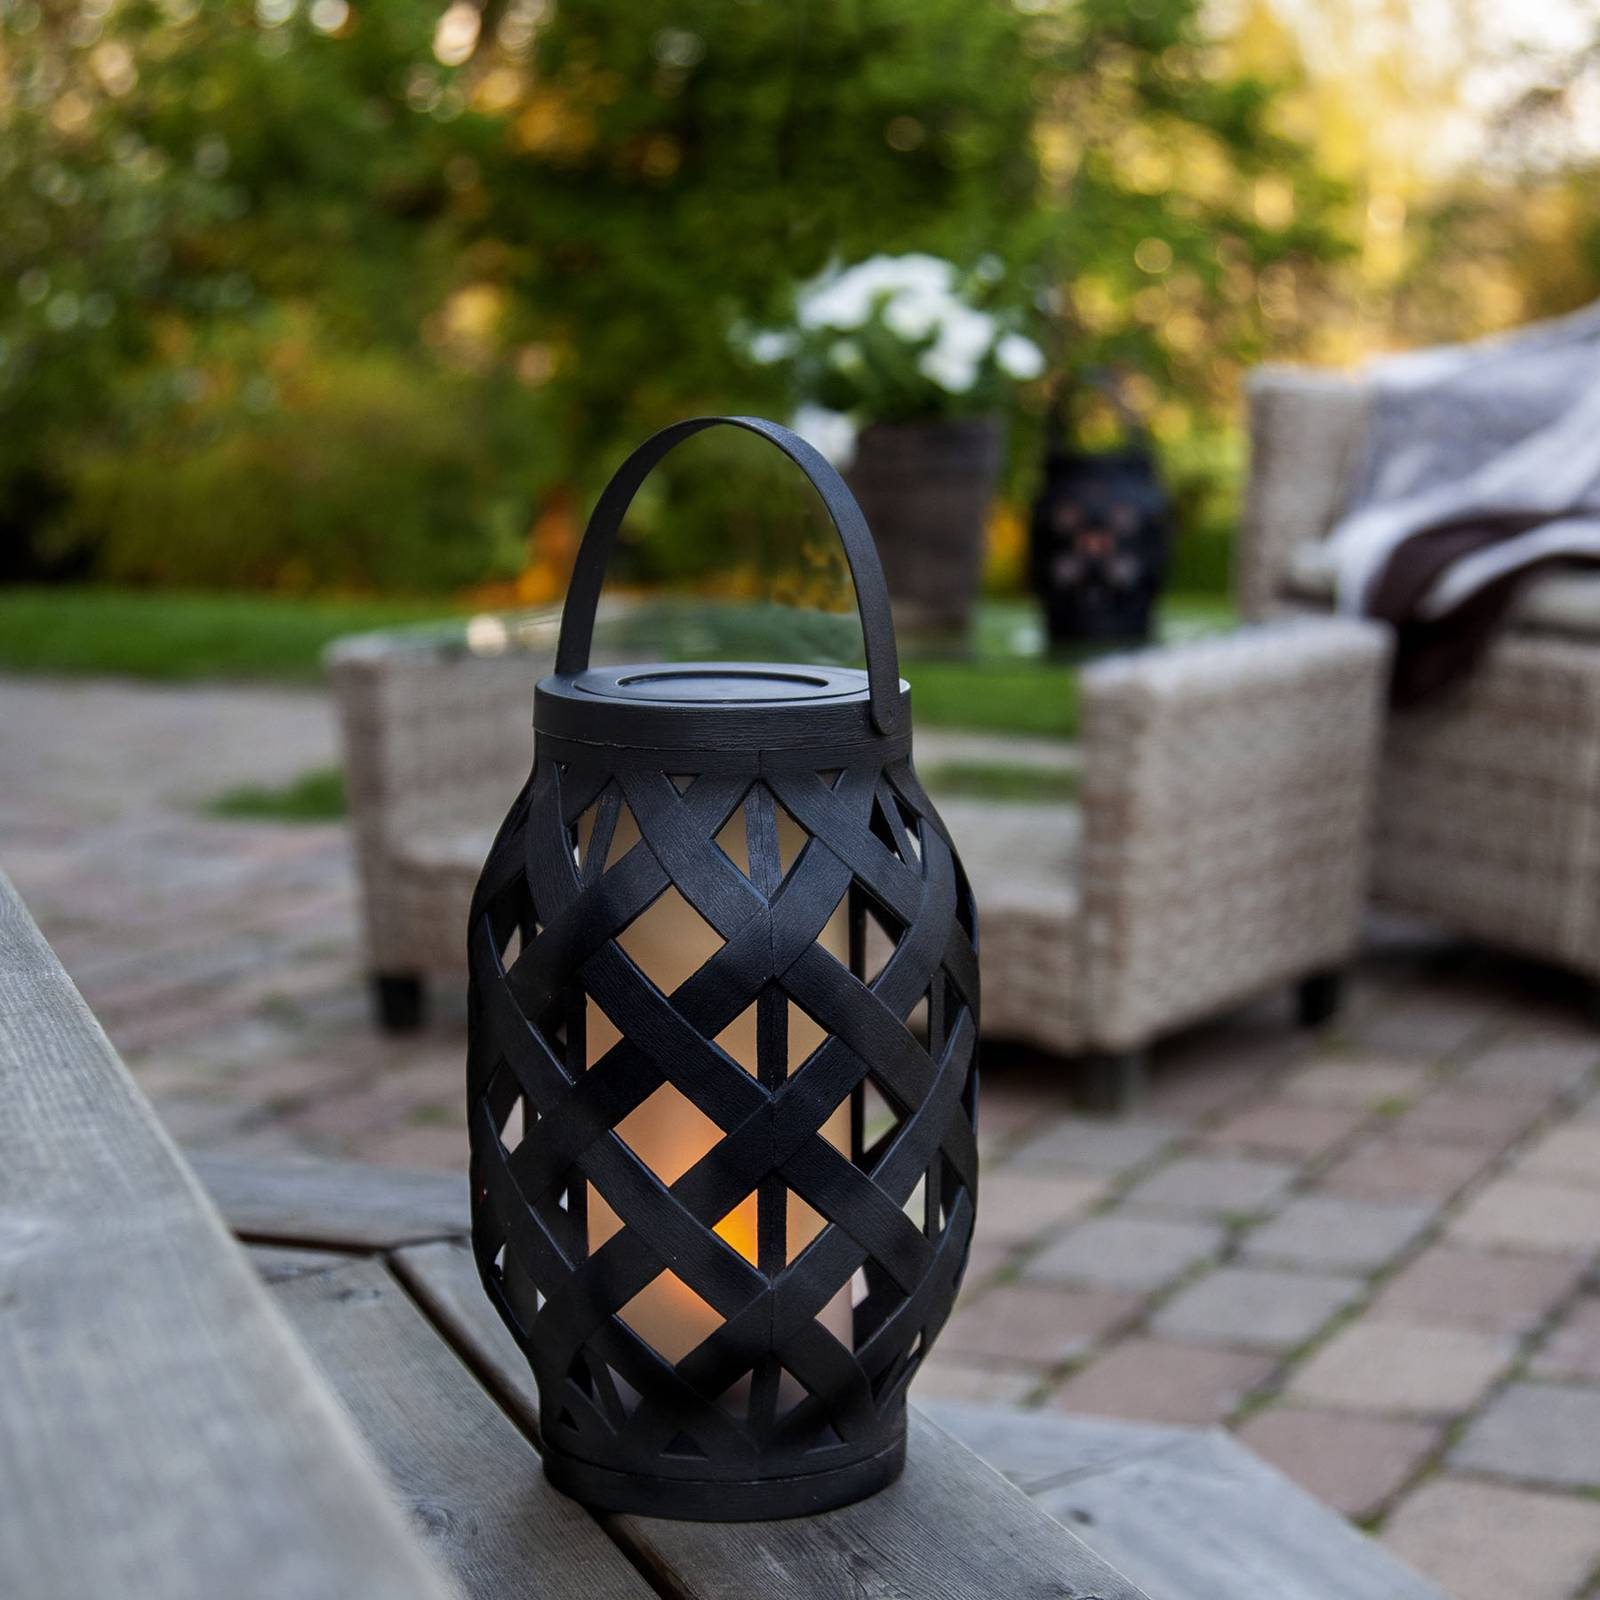 Flame Lantern -LED-lyhty, musta, korkeus 23 cm